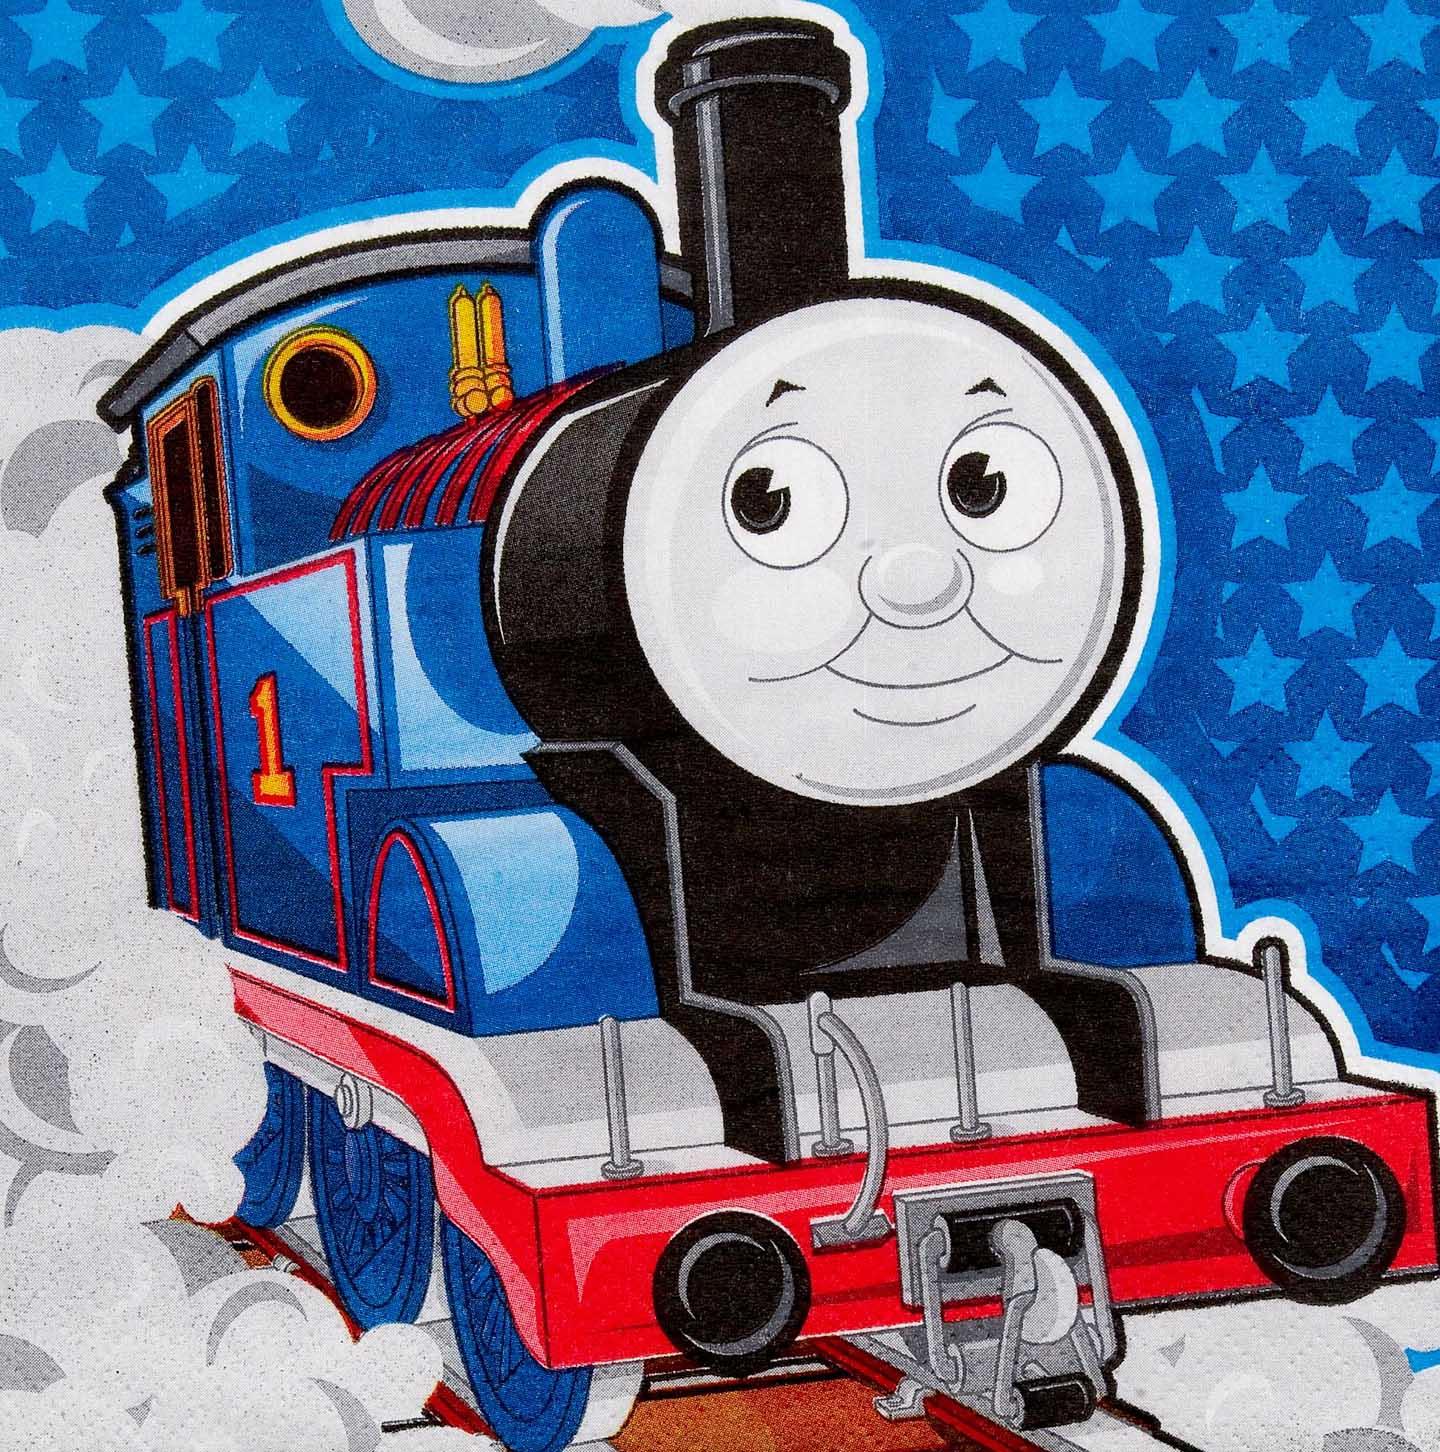 Thomas the tank engine wallpaper border - Disney Automotive Thomas The Tank Engine Cartoon Wallpaper